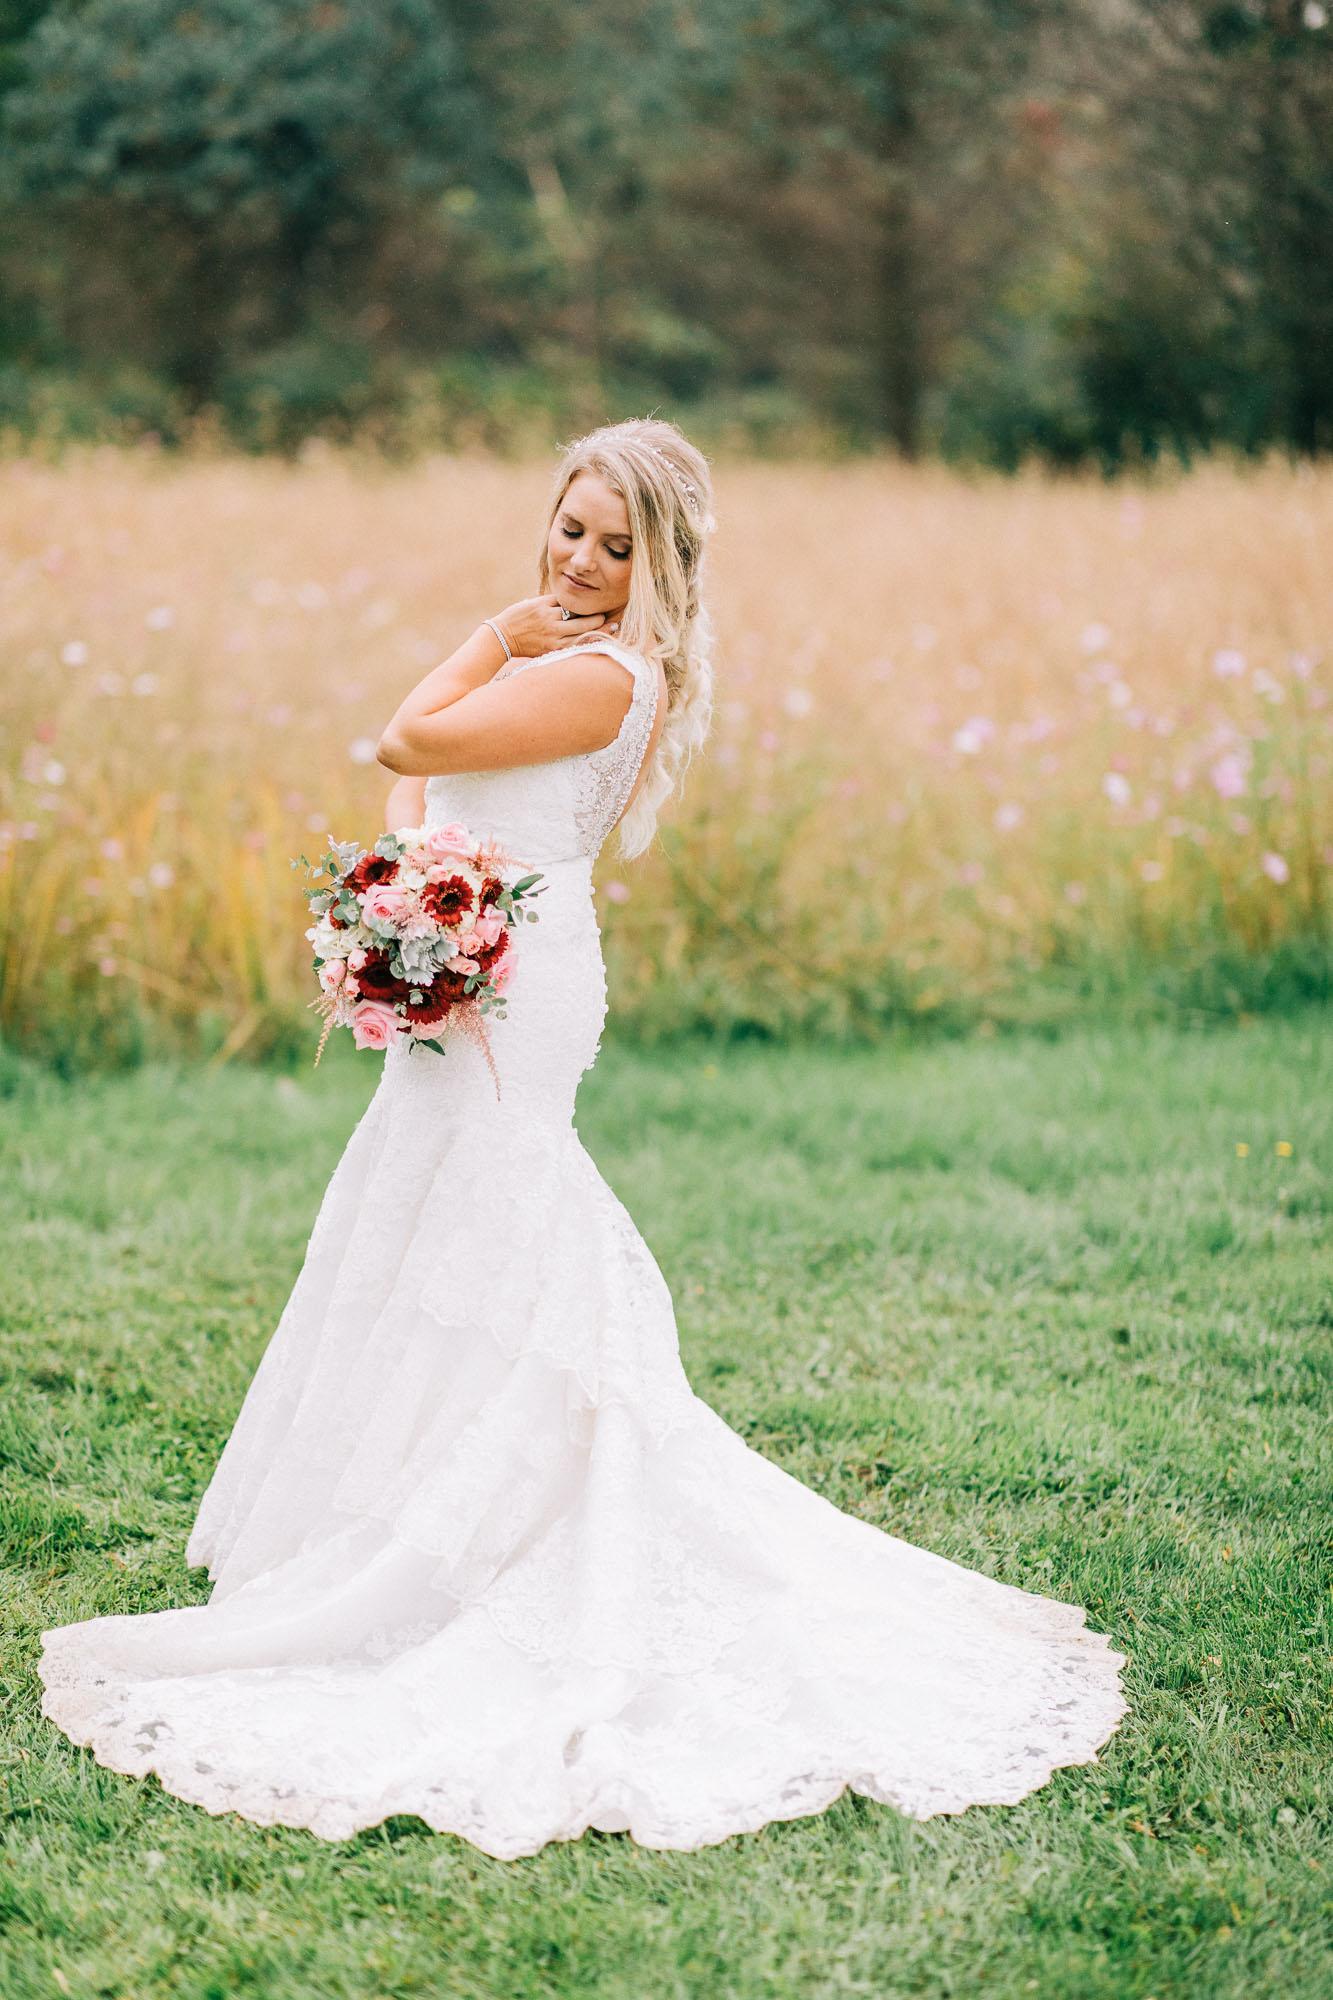 Lodge-at-Raven-Creek-October-wedding-57.jpg